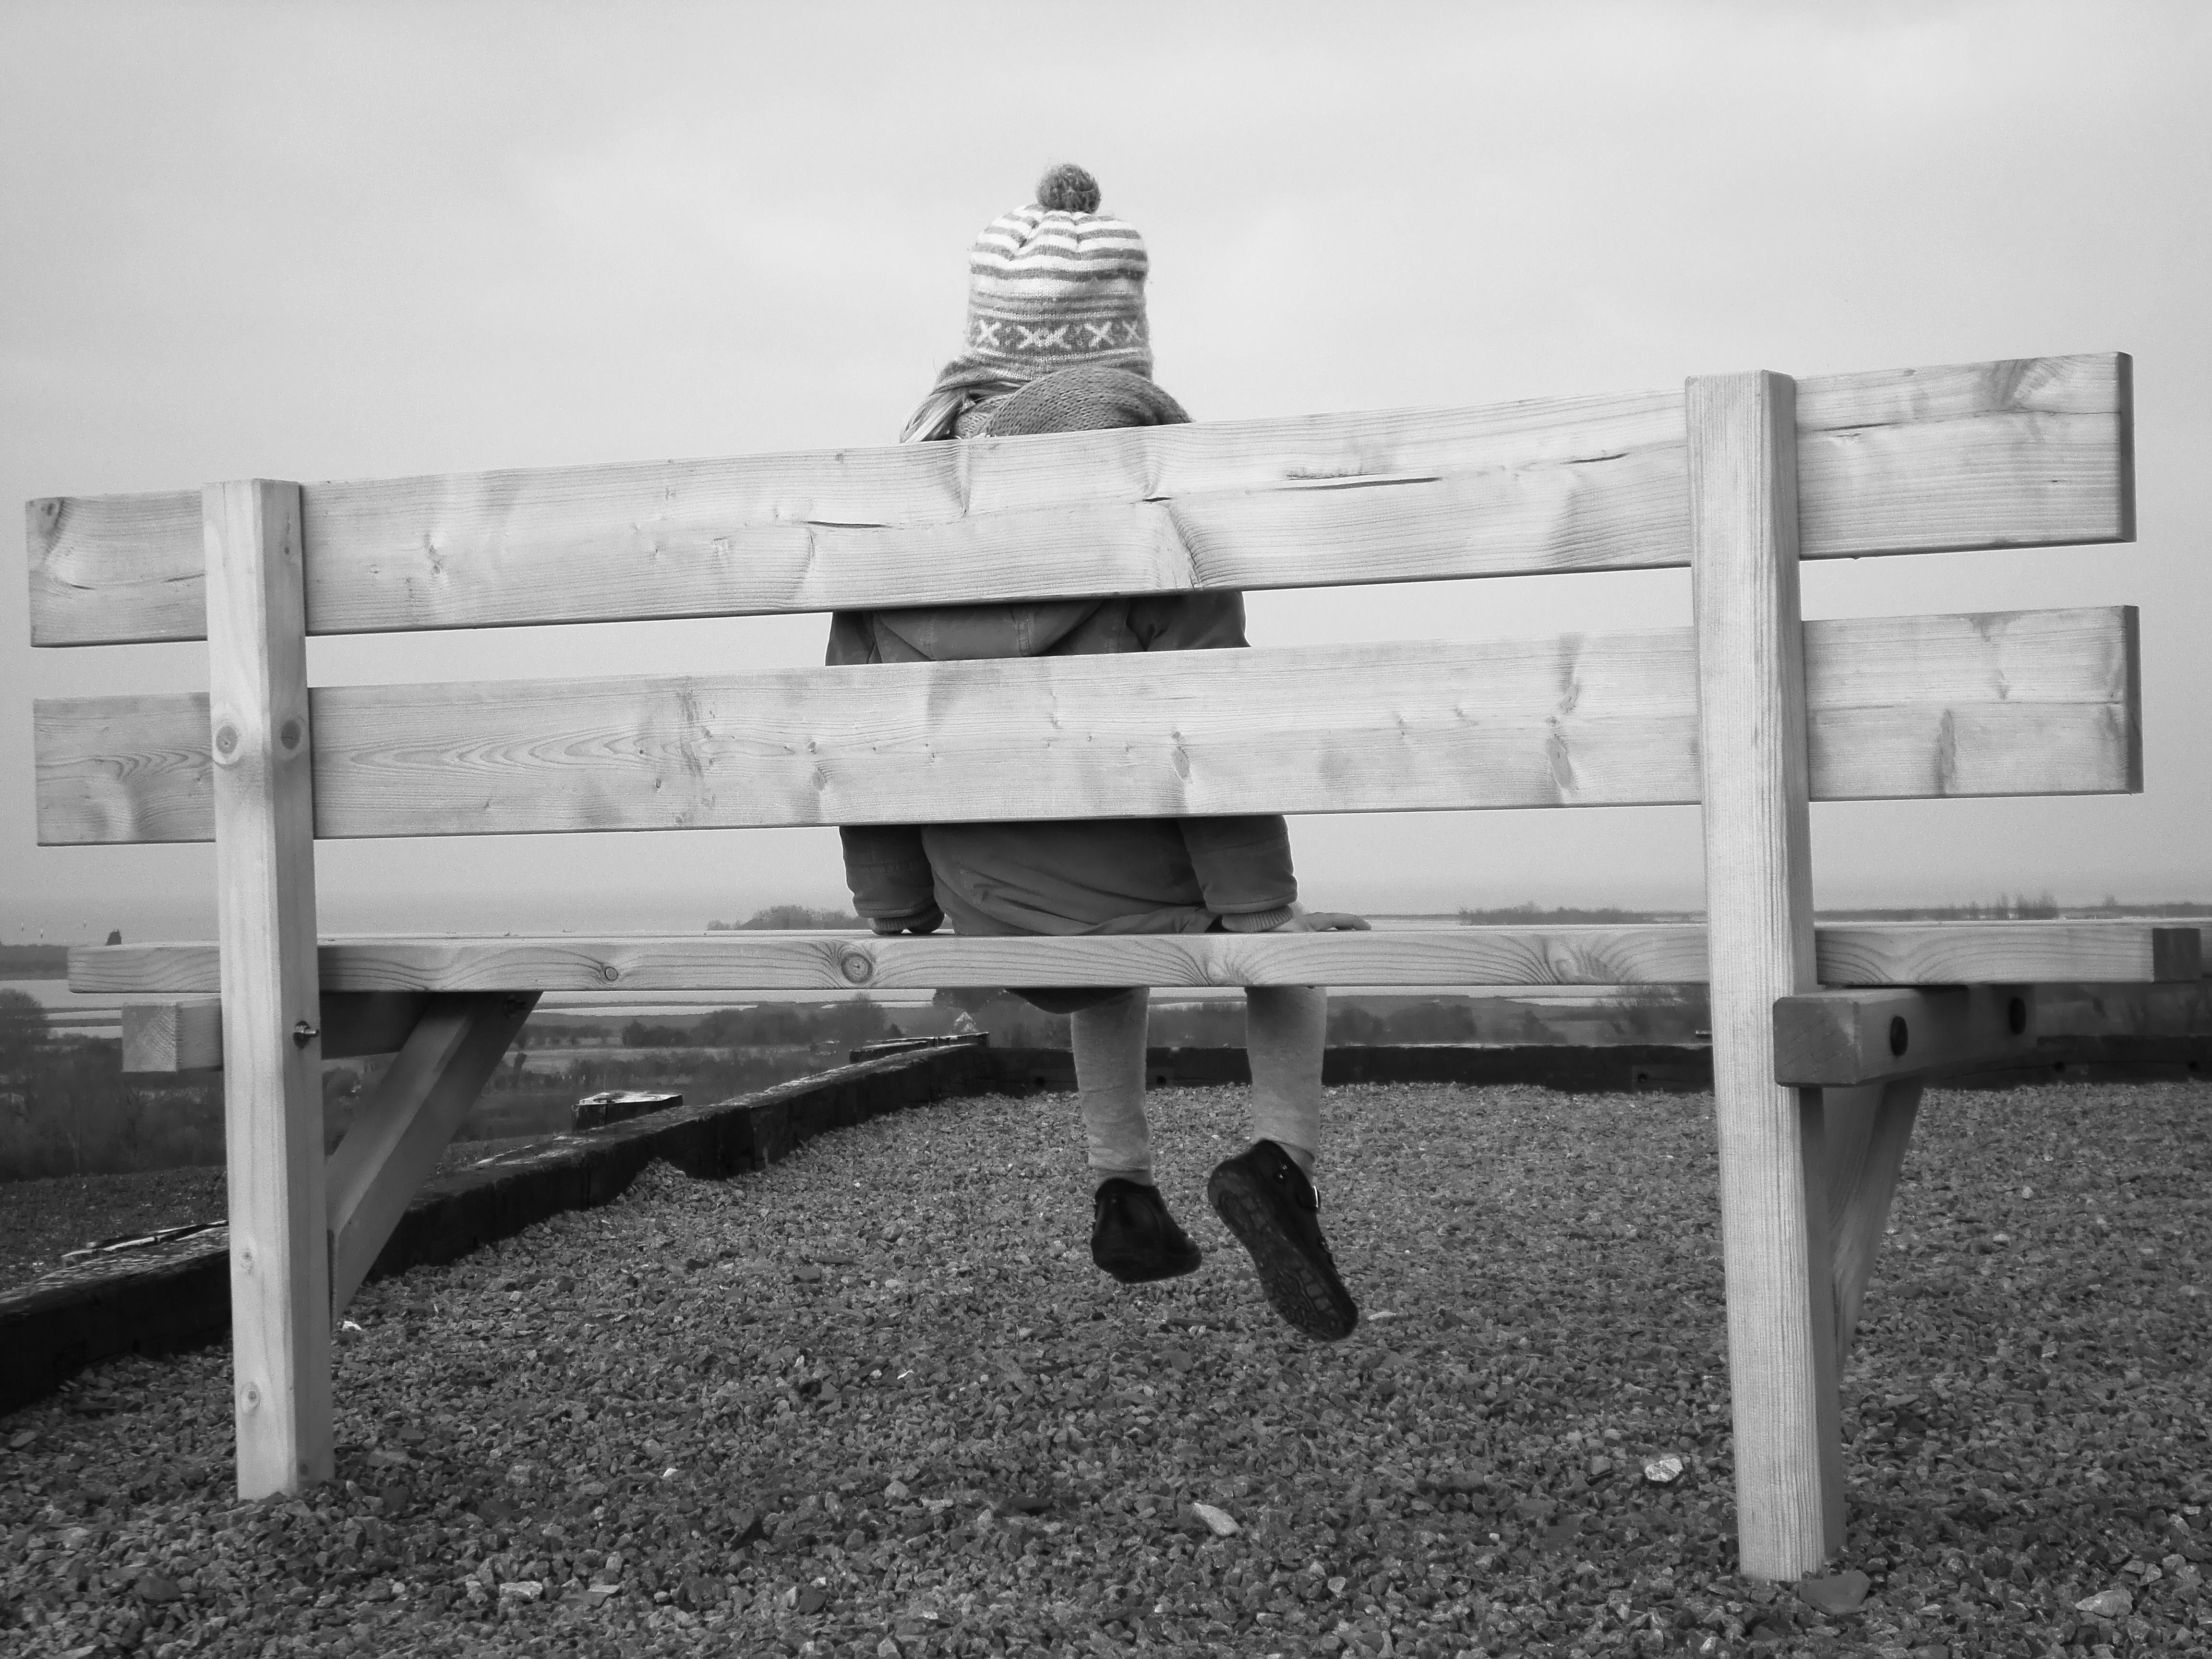 Meja Hitam Dan Putih Kayu Gadis Bangku Fotografi Kursi Anak Mebel Satu Warna Patung